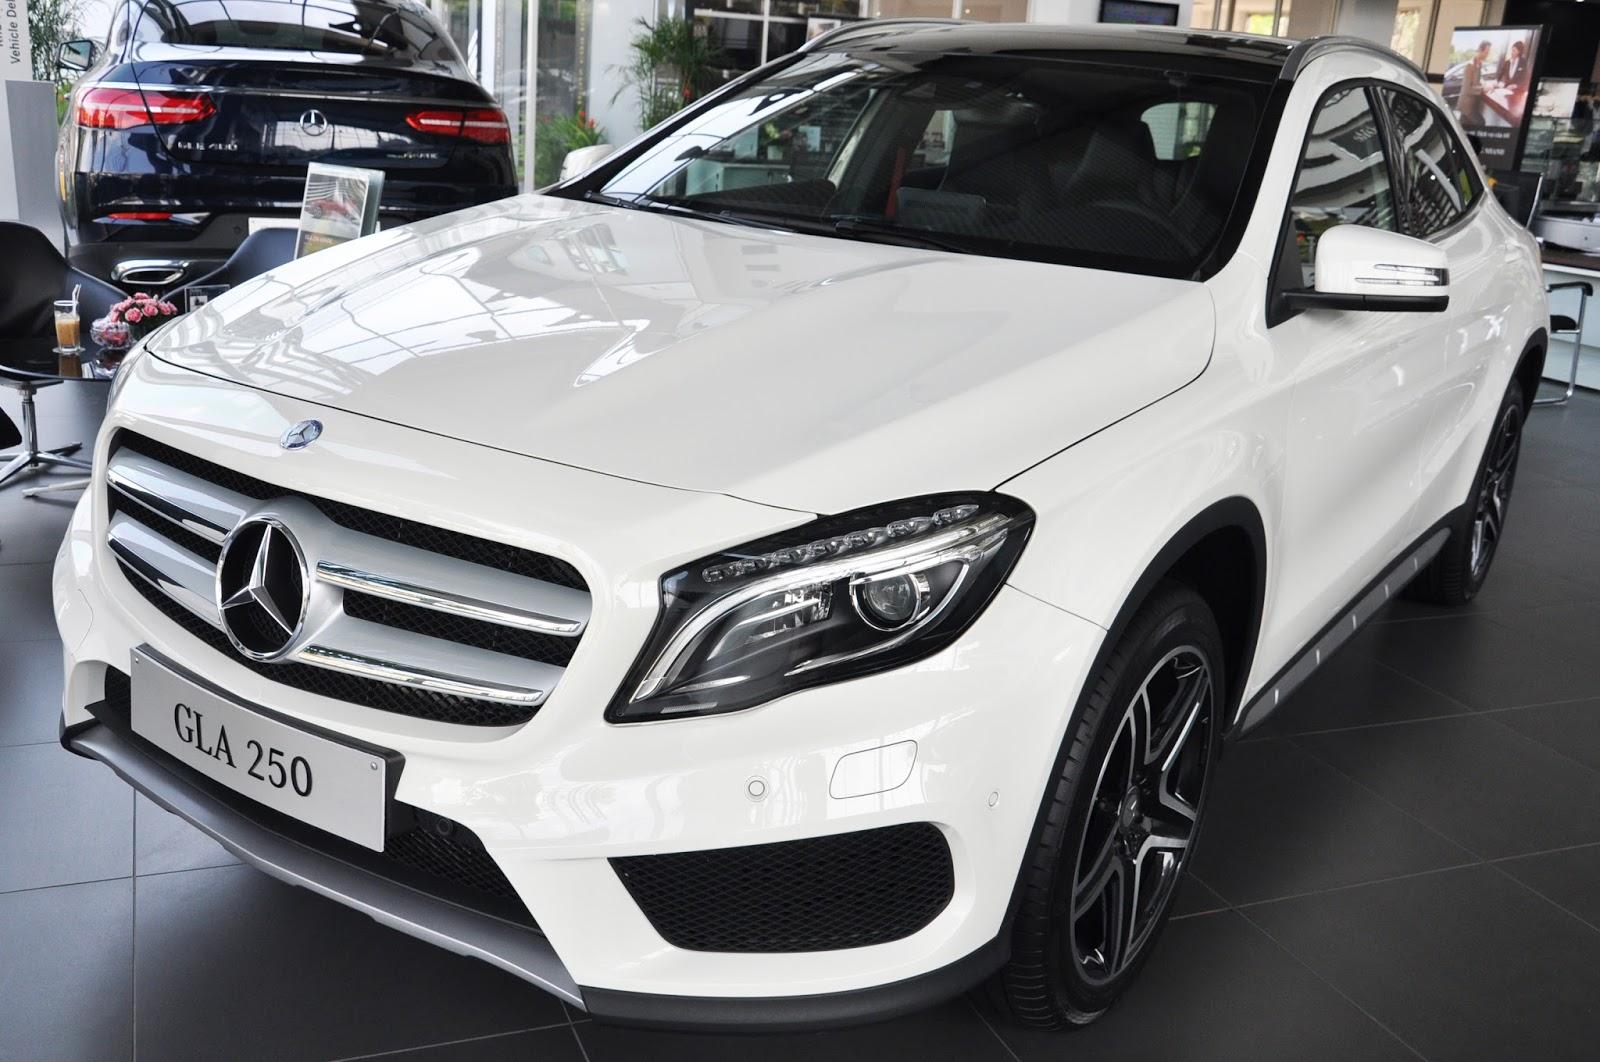 Xe Mercedes Benz GLA 250 4Matic màu trắng 01